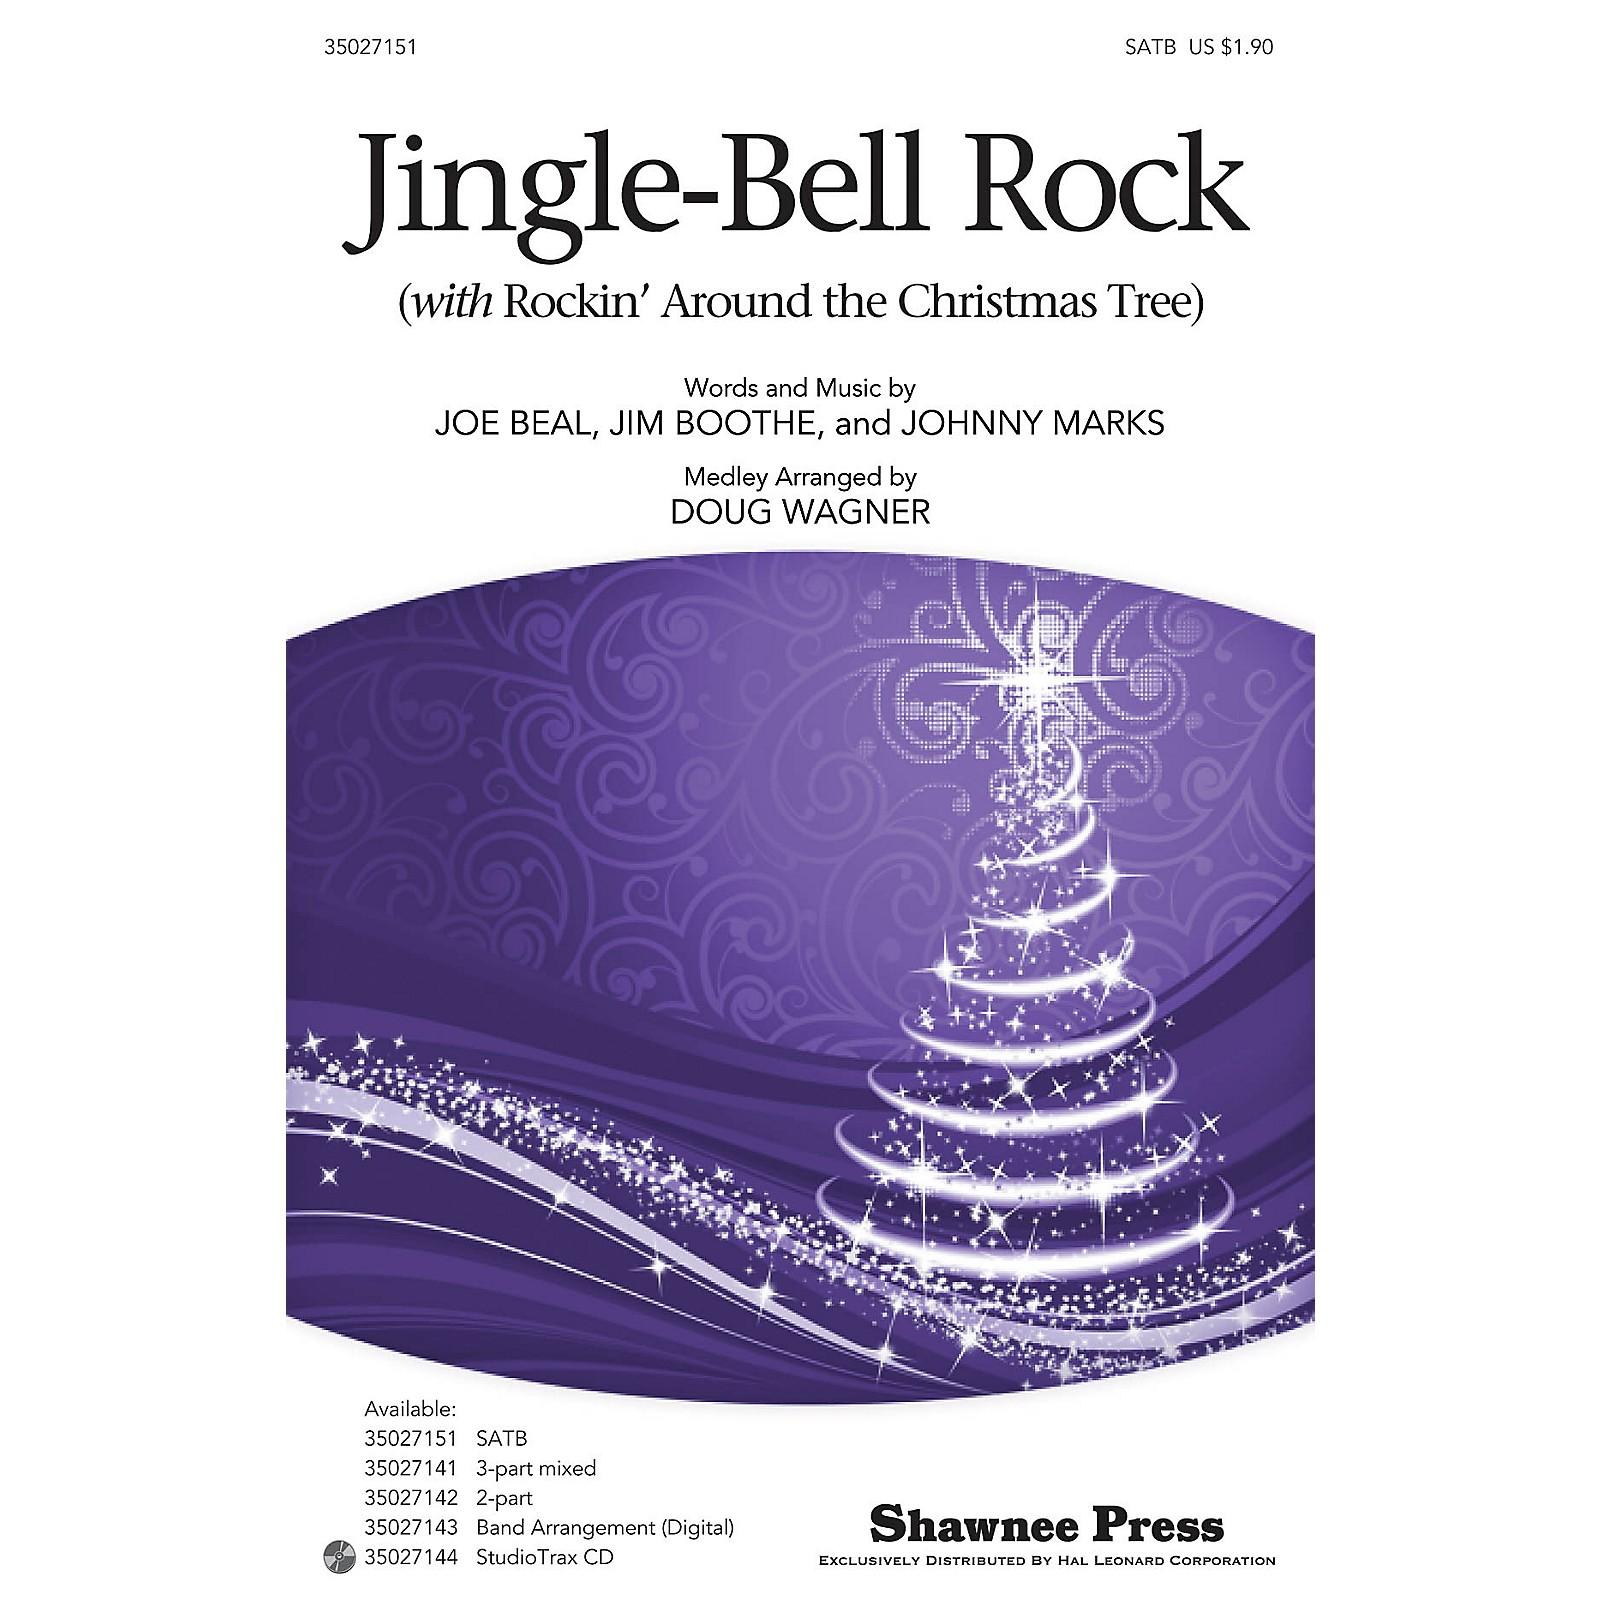 Hal Leonard Jingle-Bell Rock (with Rockin' Around the Christmas Tree) Studiotrax CD Arranged by Douglas Wagner